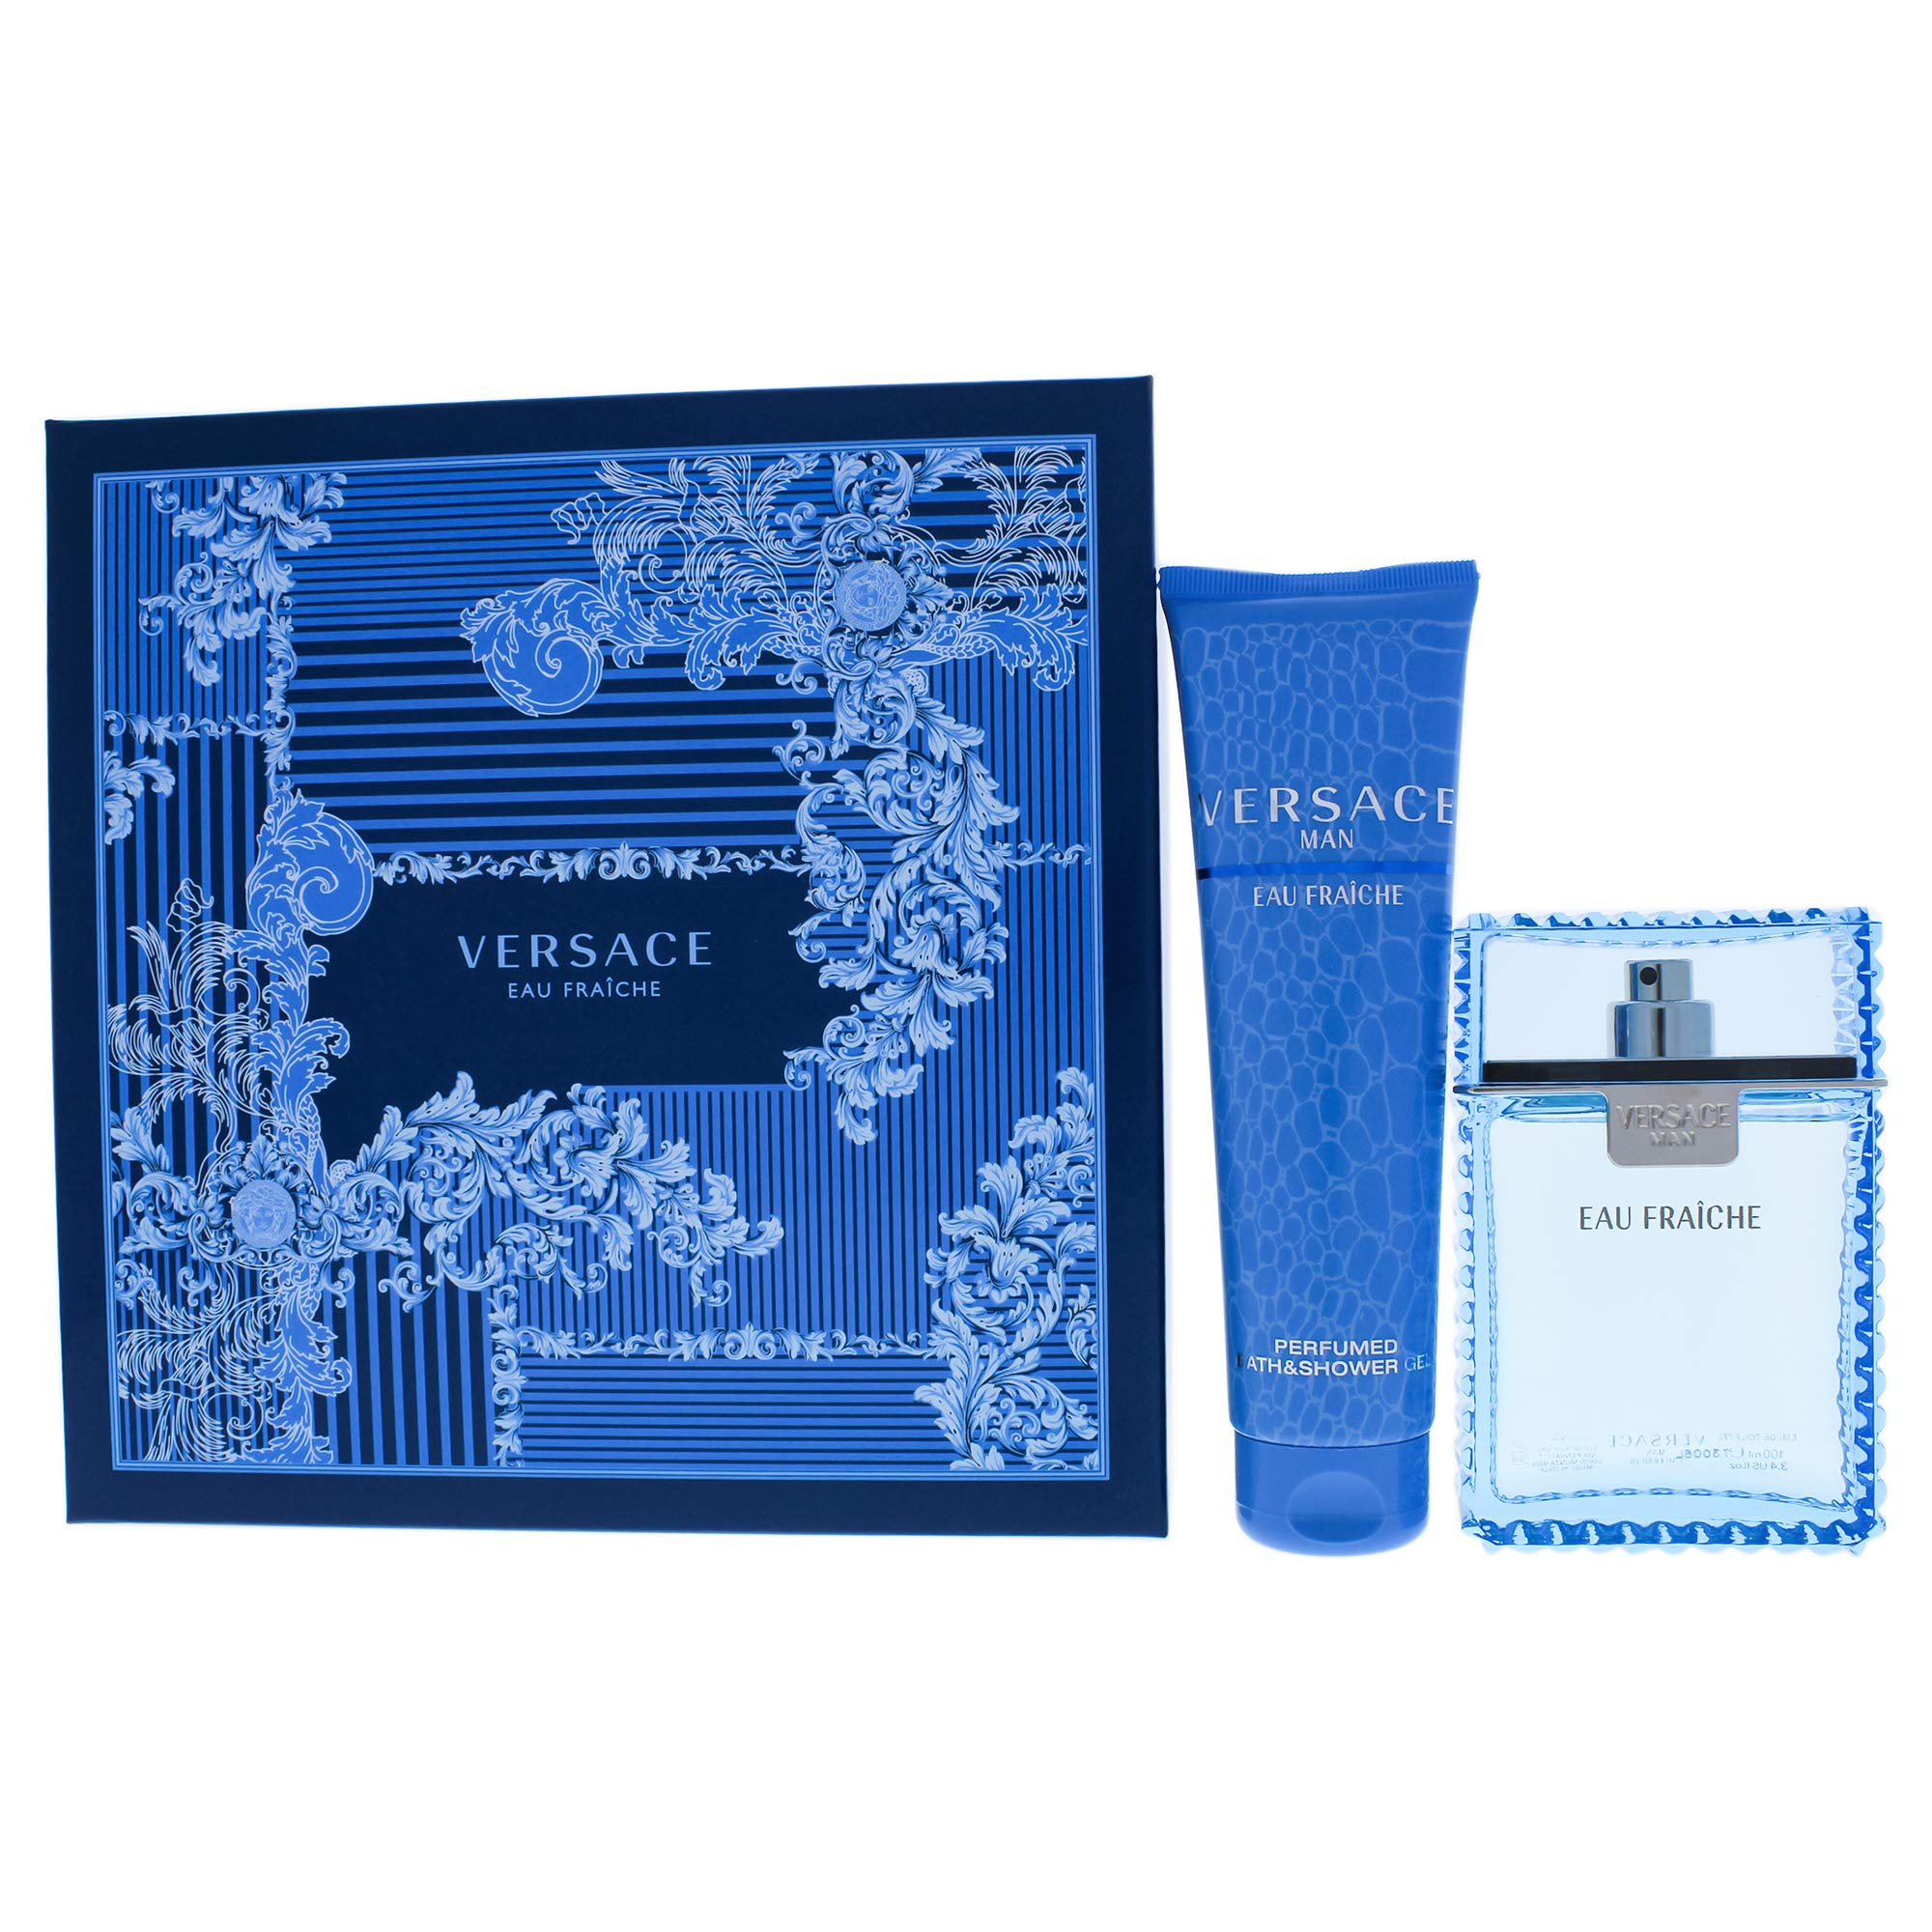 Versace Man Eau Fraiche by Versace for Men - 2 Pc Gift Set 3.4oz EDT Spray, 5oz Perfumed Bath and Shower Gel by Versace